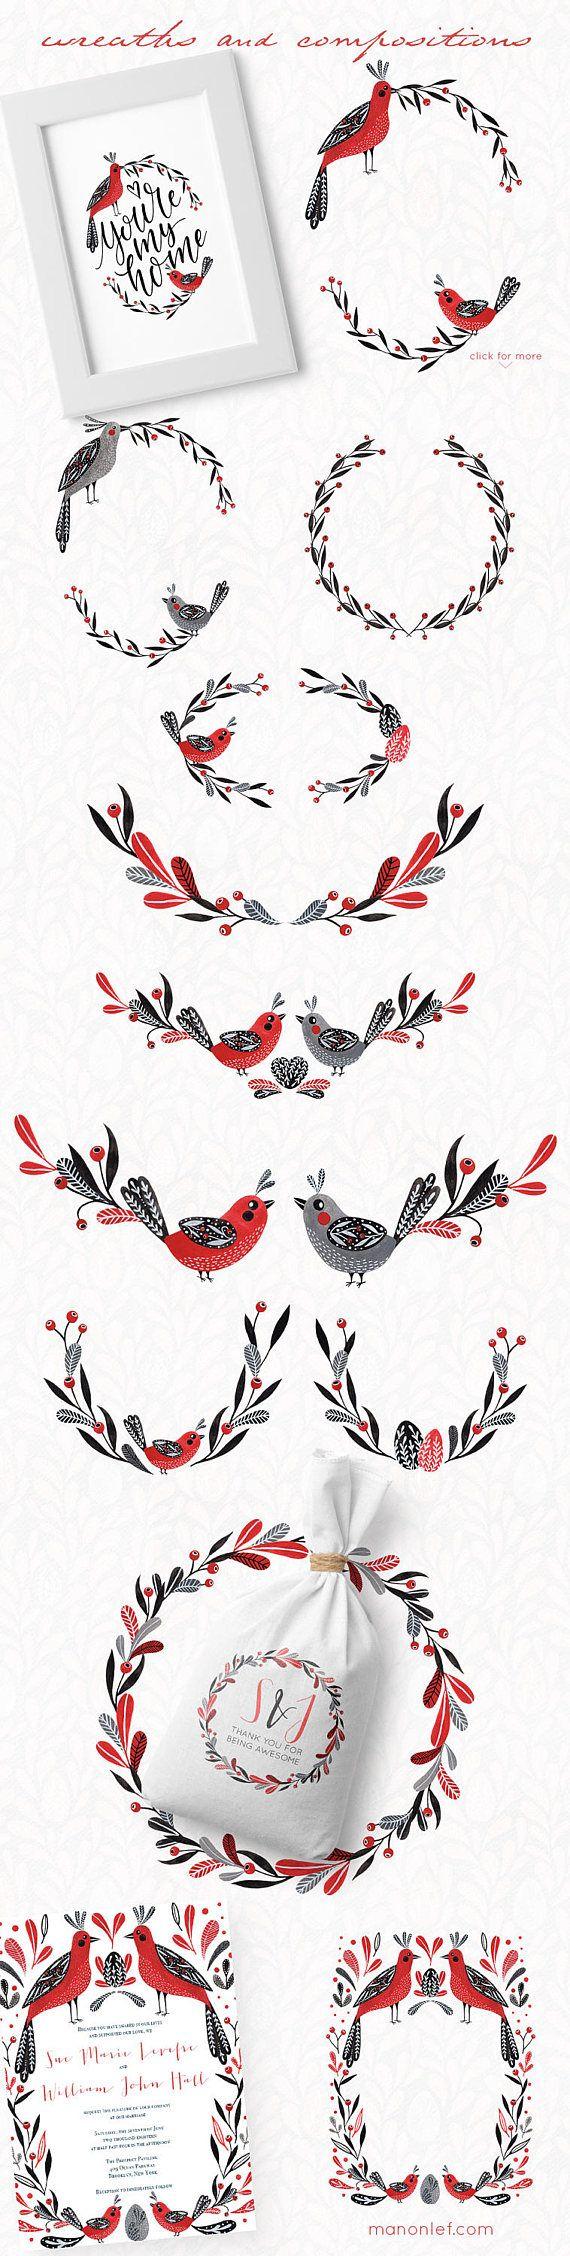 folk clipart birds clipart wreath clipart easter graphics